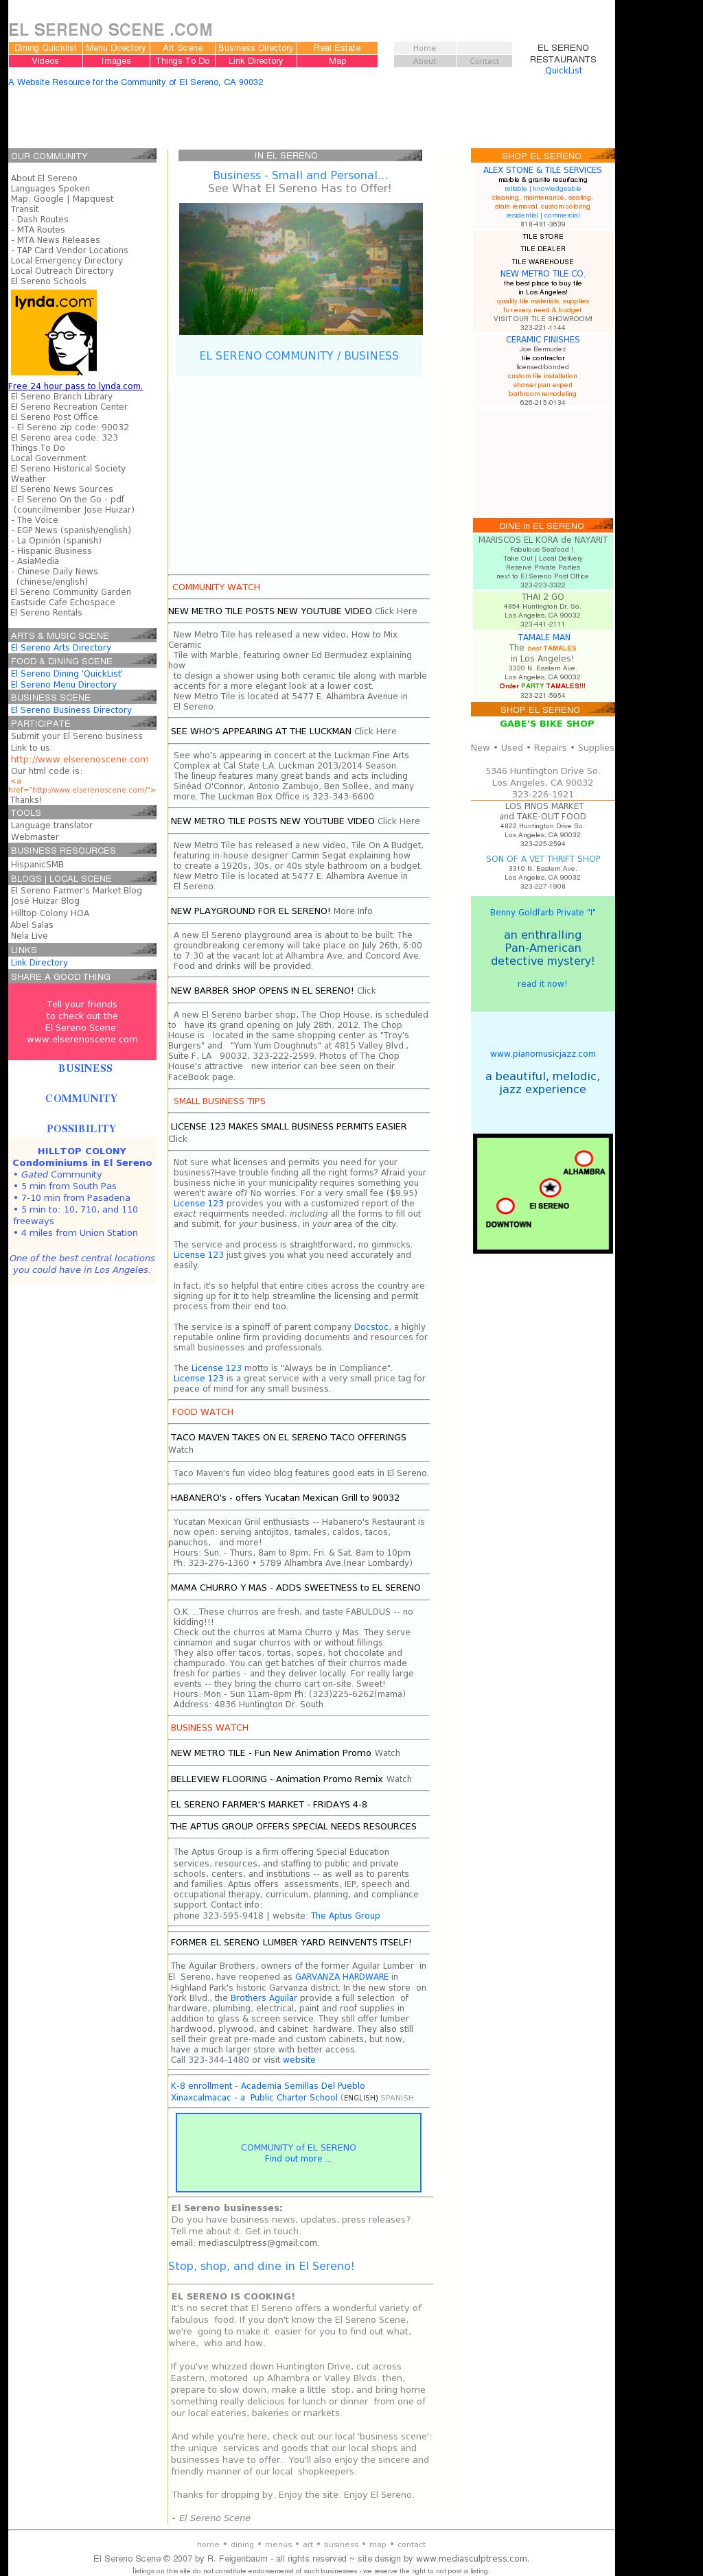 El Sereno Scene Competitors, Revenue and Employees - Owler